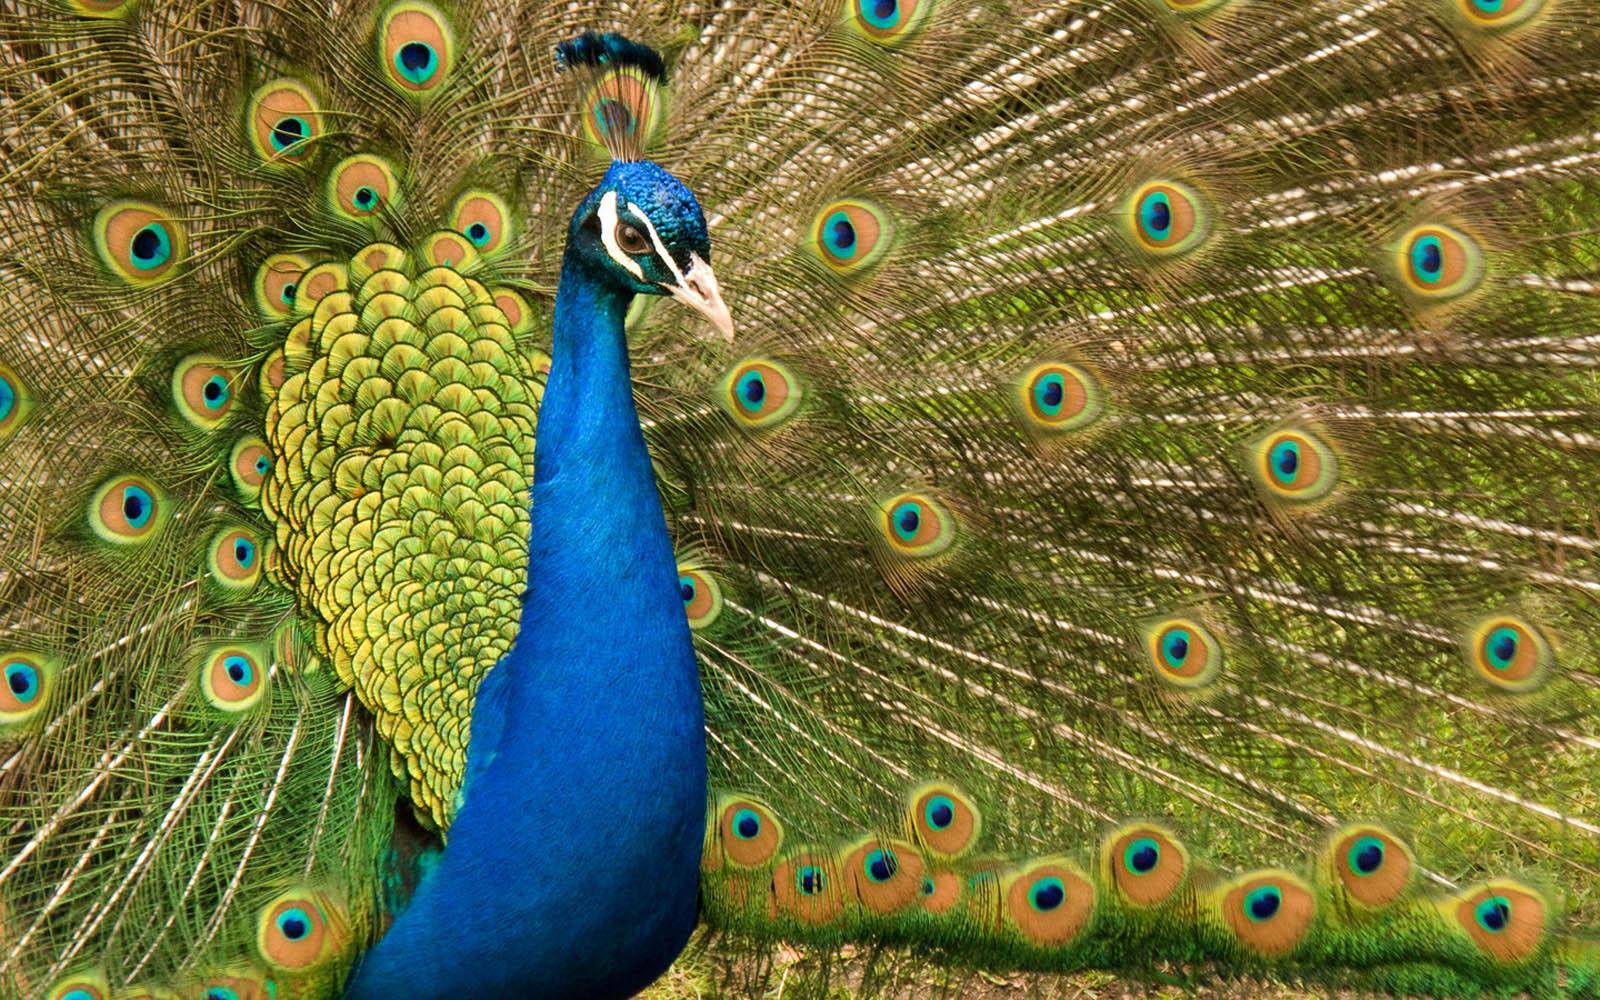 wallpapers: Peacock Wallpapers